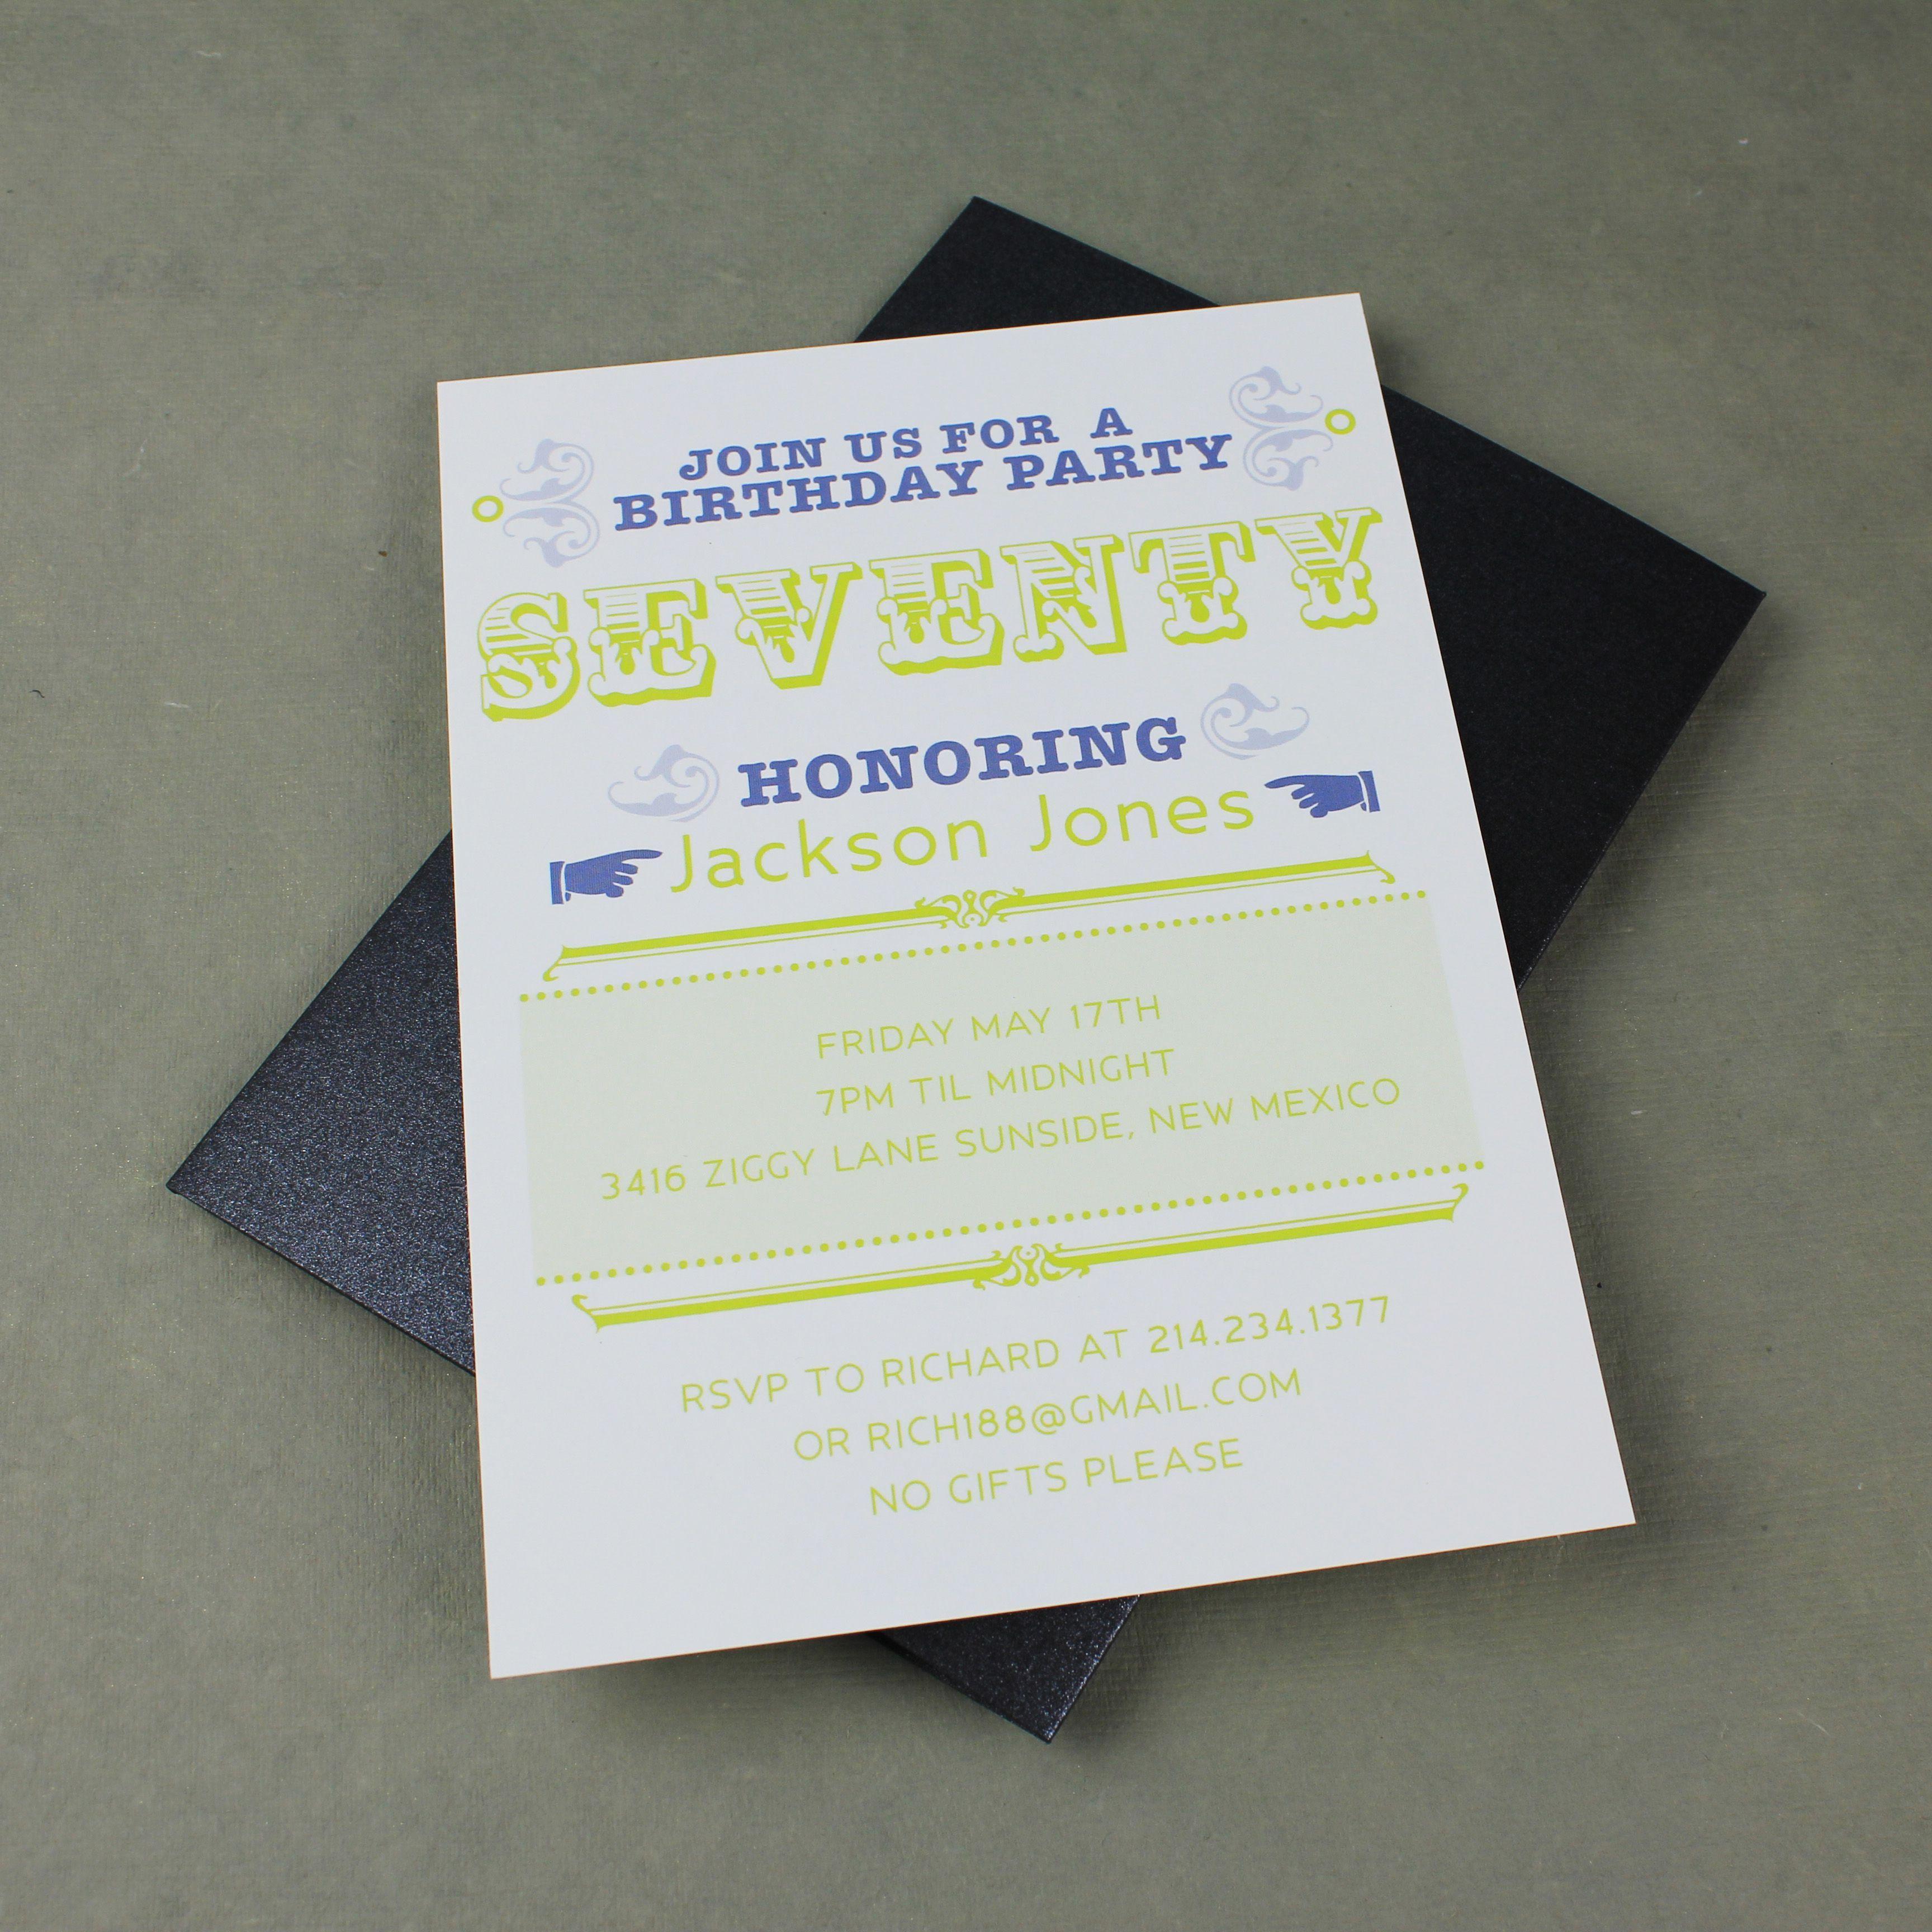 birthday invitation : 70th birthday invitations - Free Invitation ...